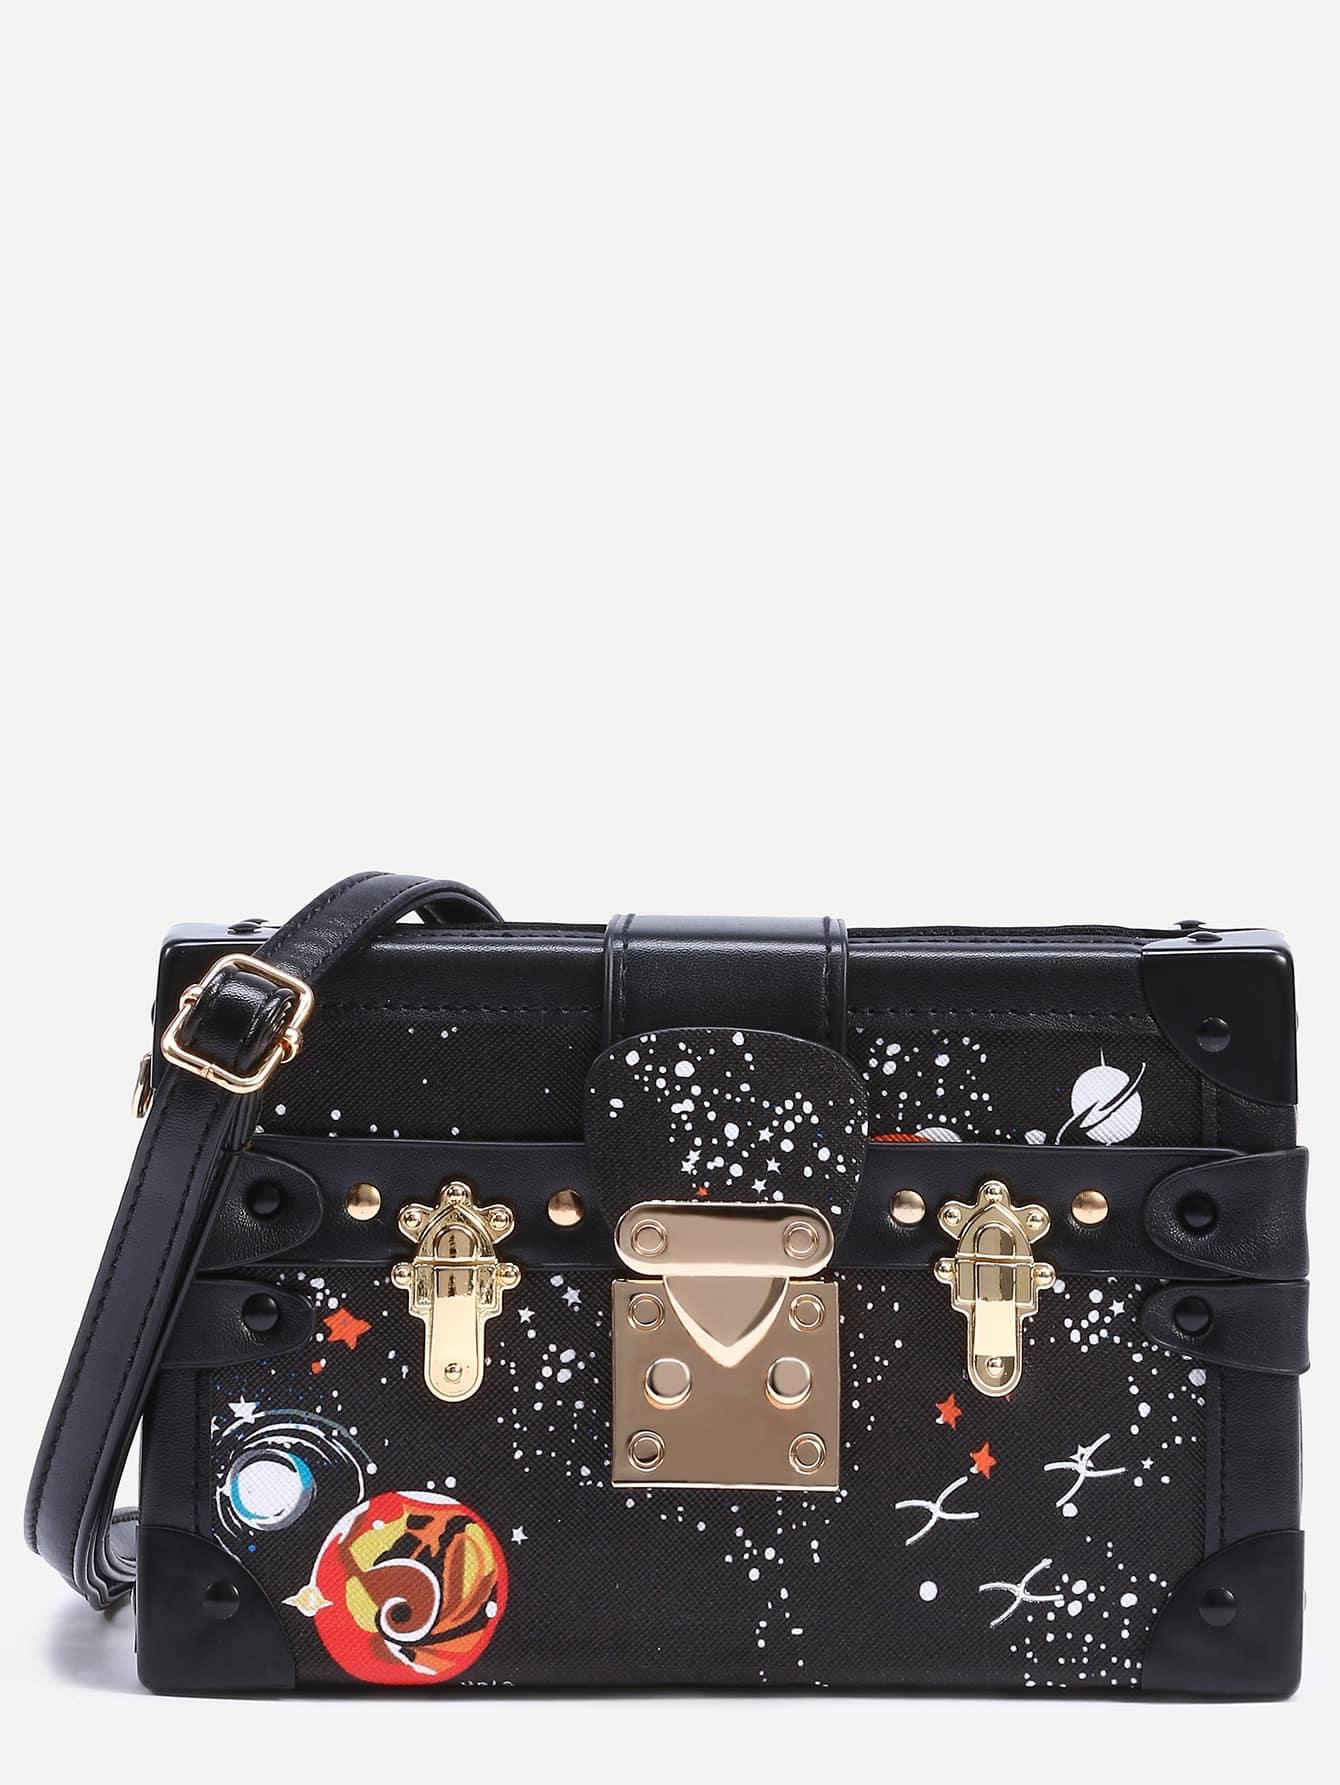 24f422d29bcfd Space Print Box Bag With Strap -SheIn(Sheinside)